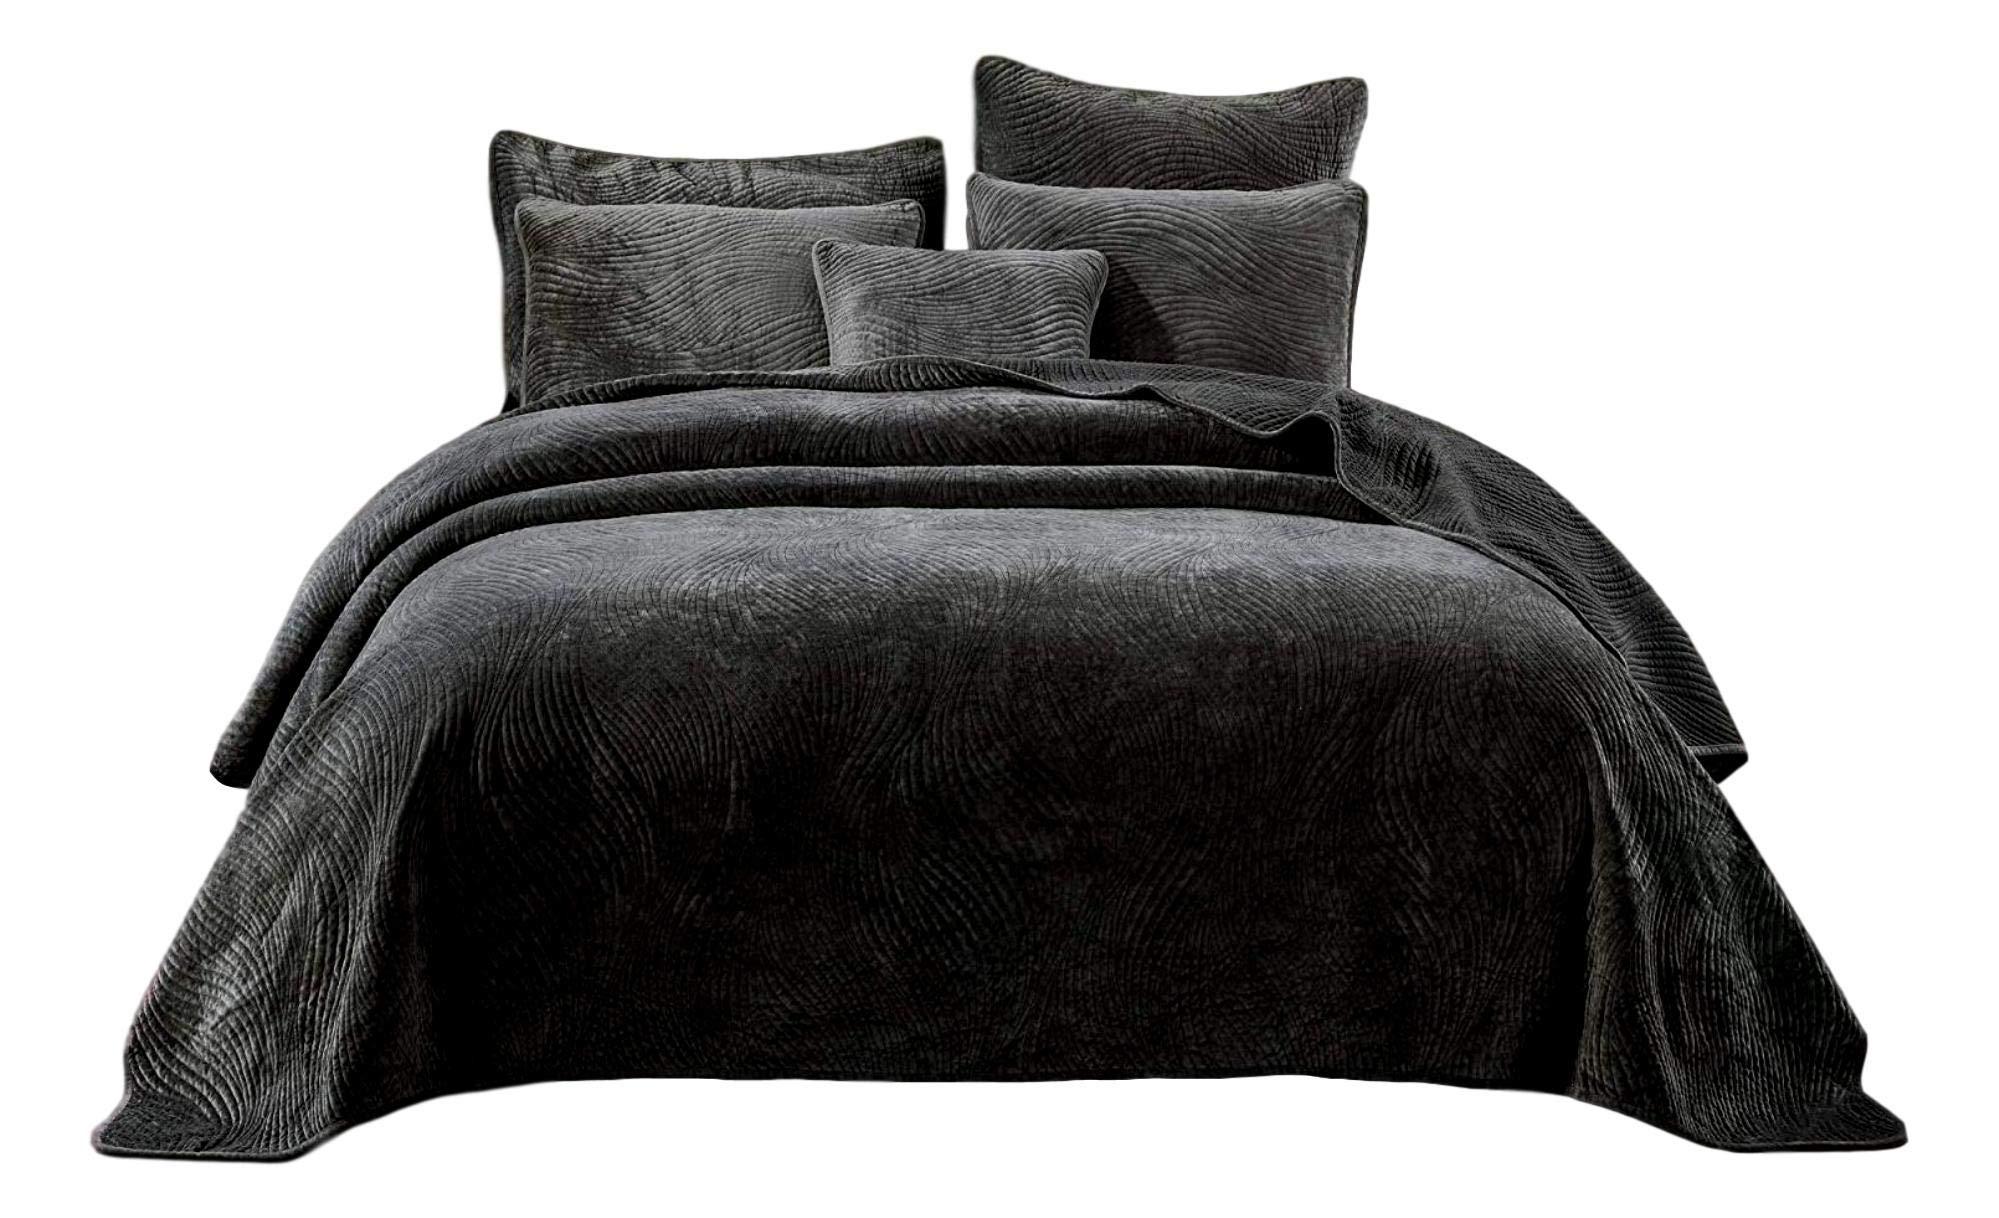 Tache Velvet Dreams Luxurious Velveteen Velour Super Soft Plush Warm Cozy Elegant Ripple Waves Stitch Quilted Coverlet Taupe Gray Brown Bedspread Set, Full